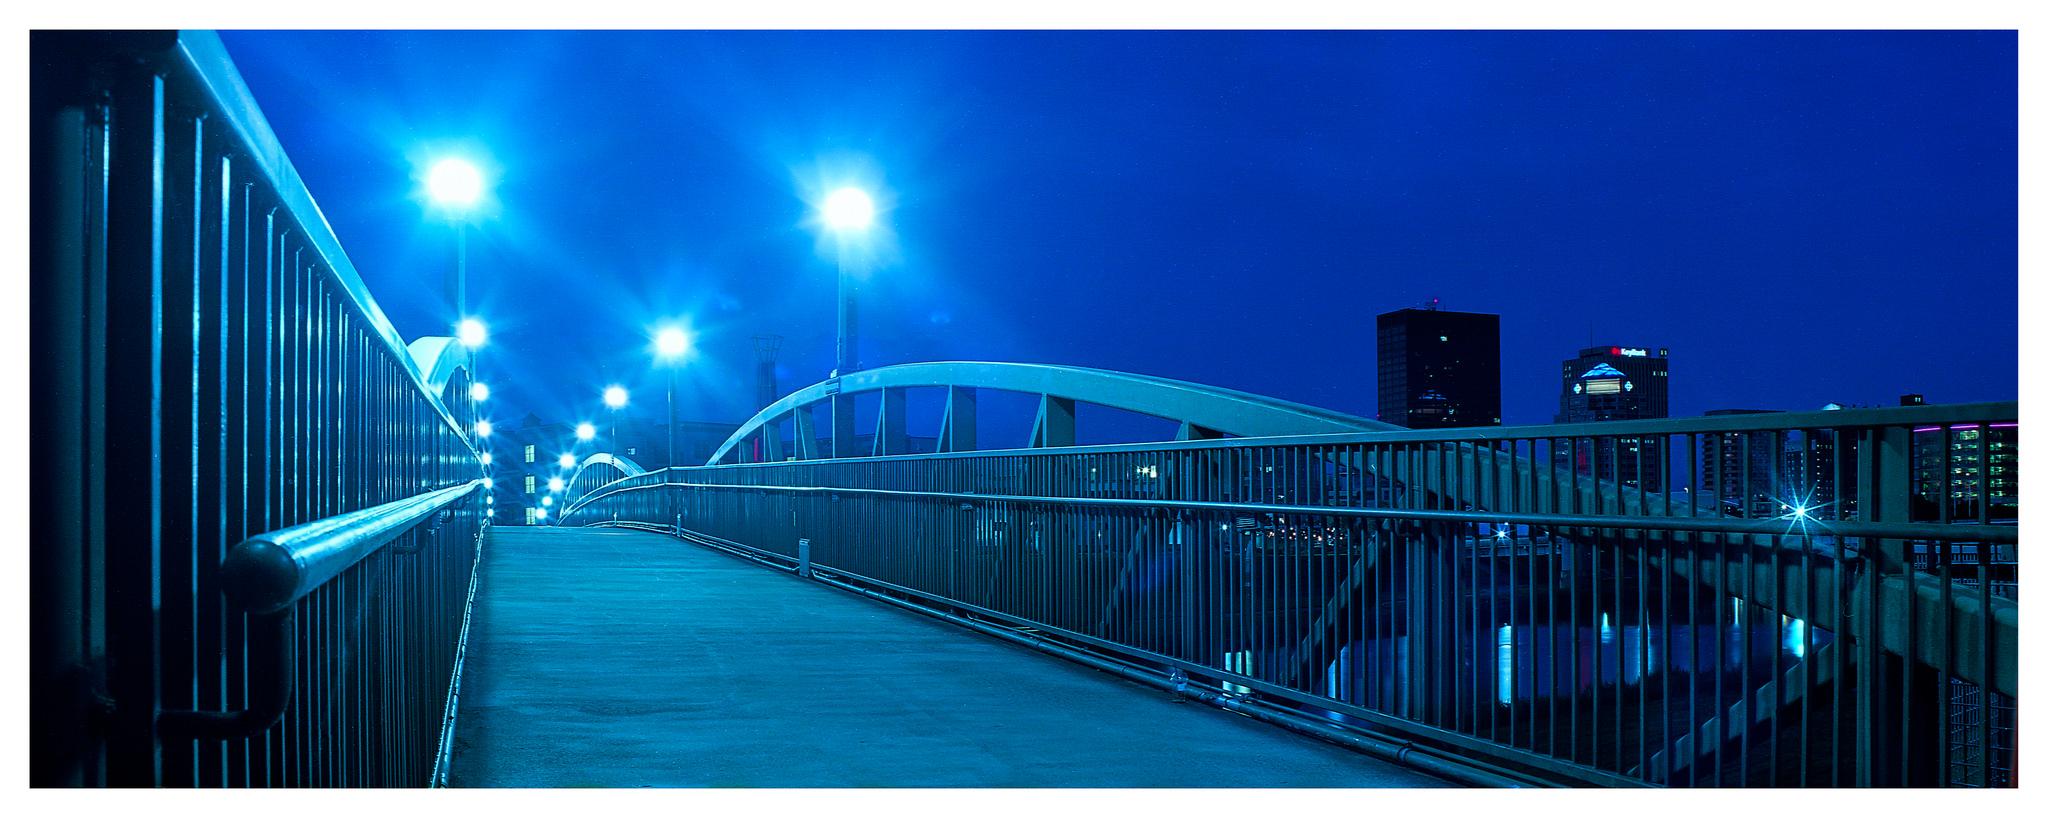 Bridge to Dayton - Mamiya RB67 ProS with Ektar 35mm film